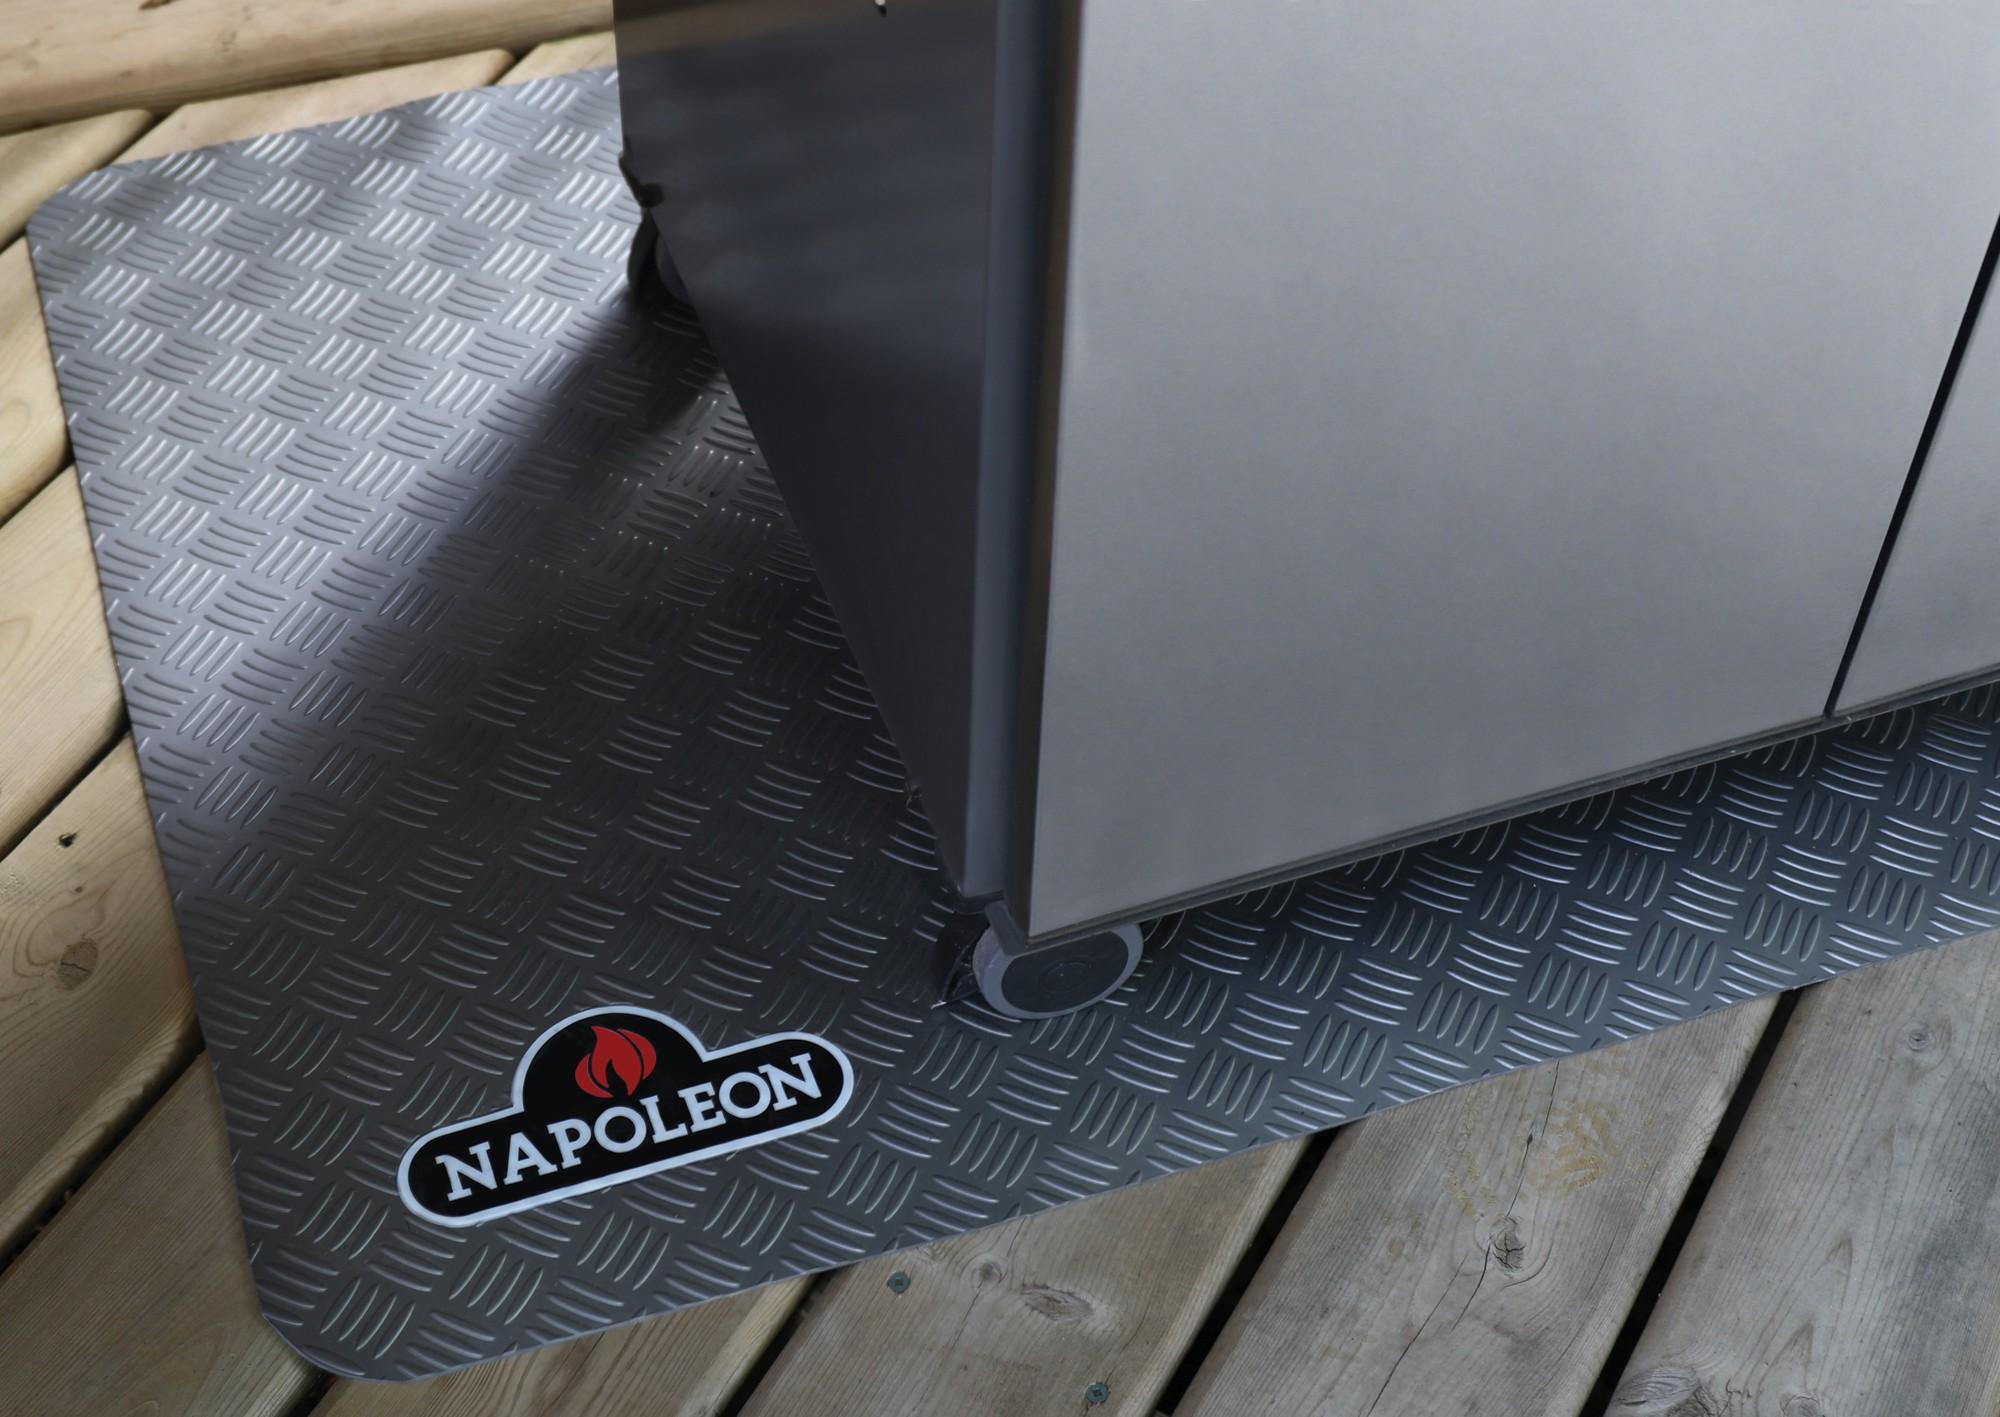 grillmatte grillunterlage napoleon 119 5x81 5cm bei. Black Bedroom Furniture Sets. Home Design Ideas